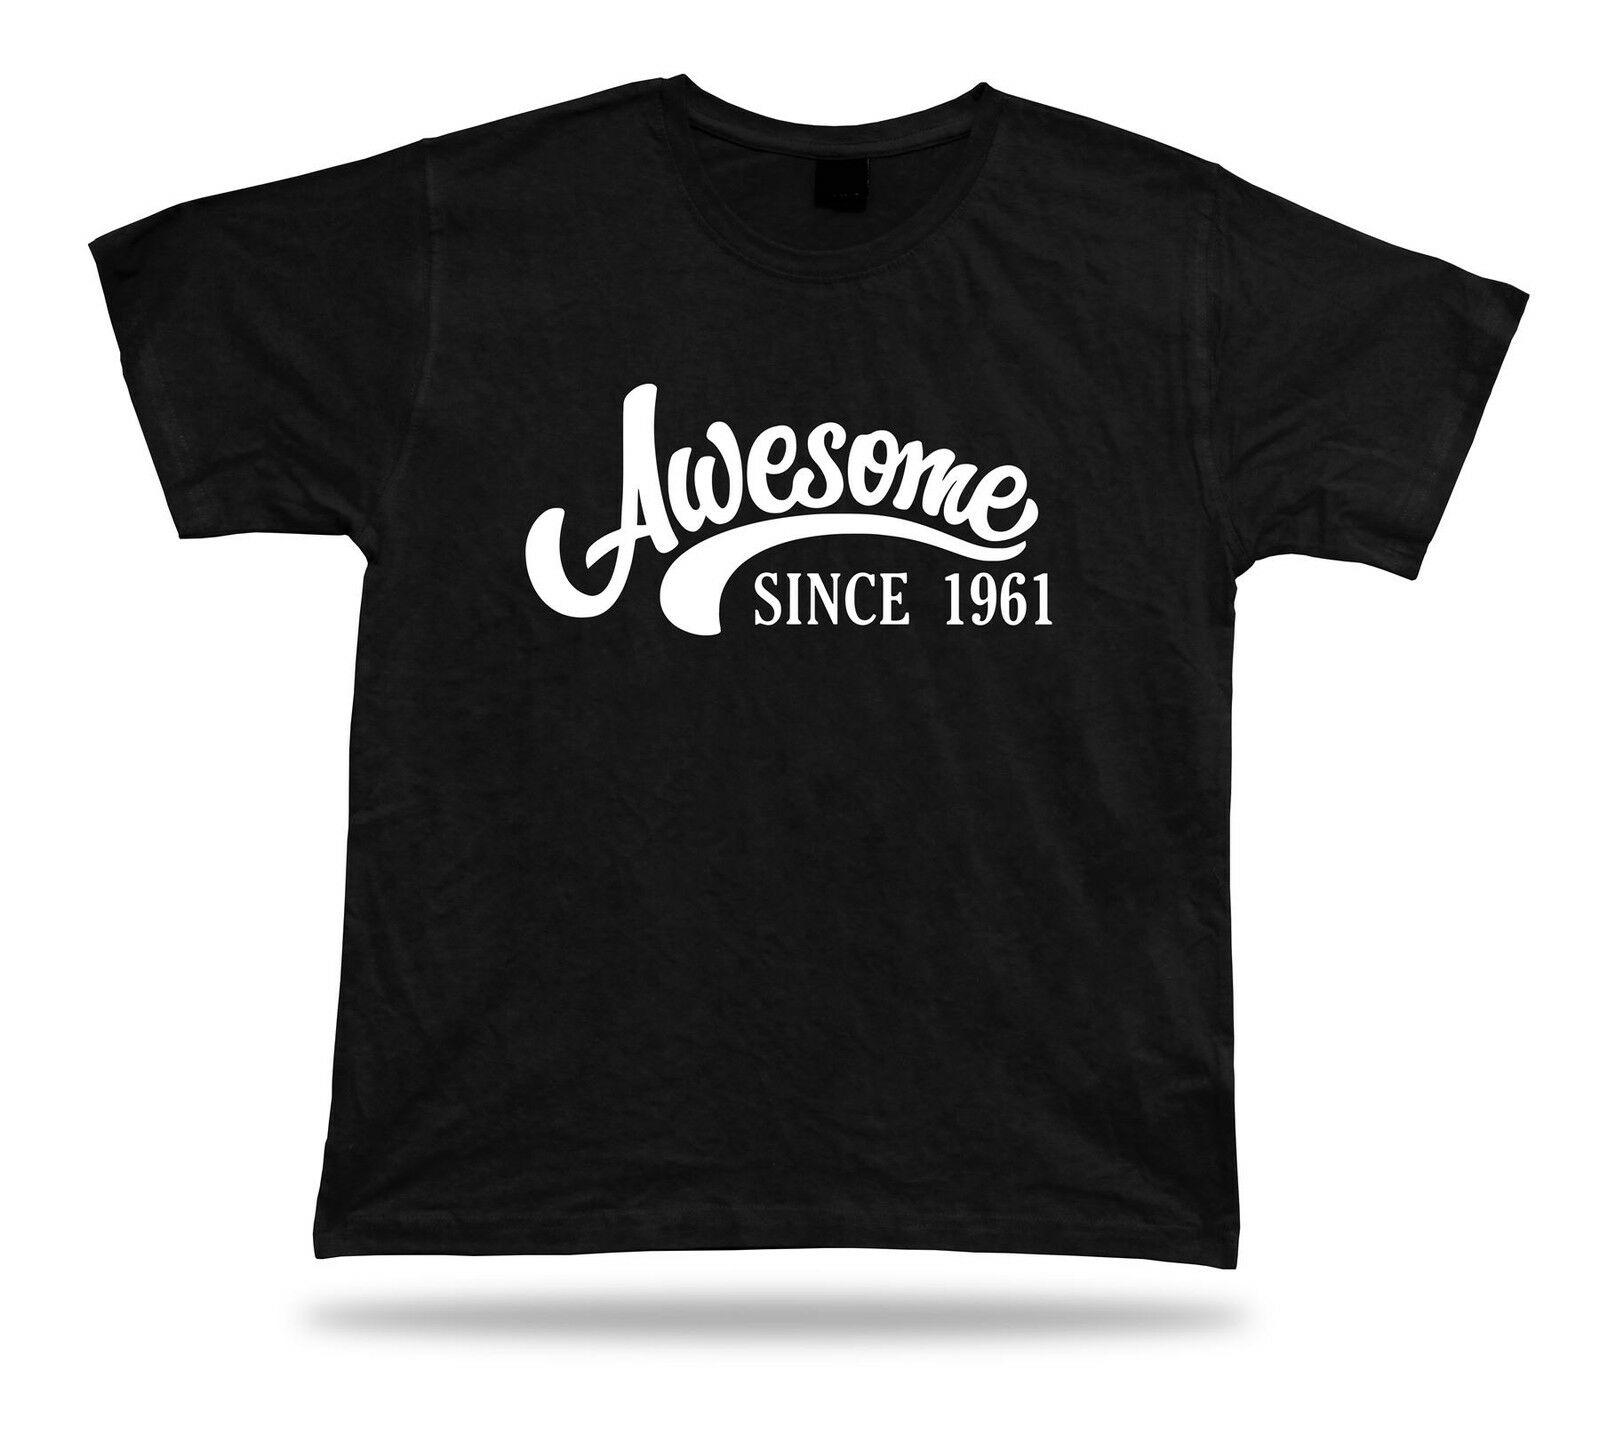 Camiseta impresa, camiseta impresionante desde 1961, regalo de feliz cumpleaños, Idea Original